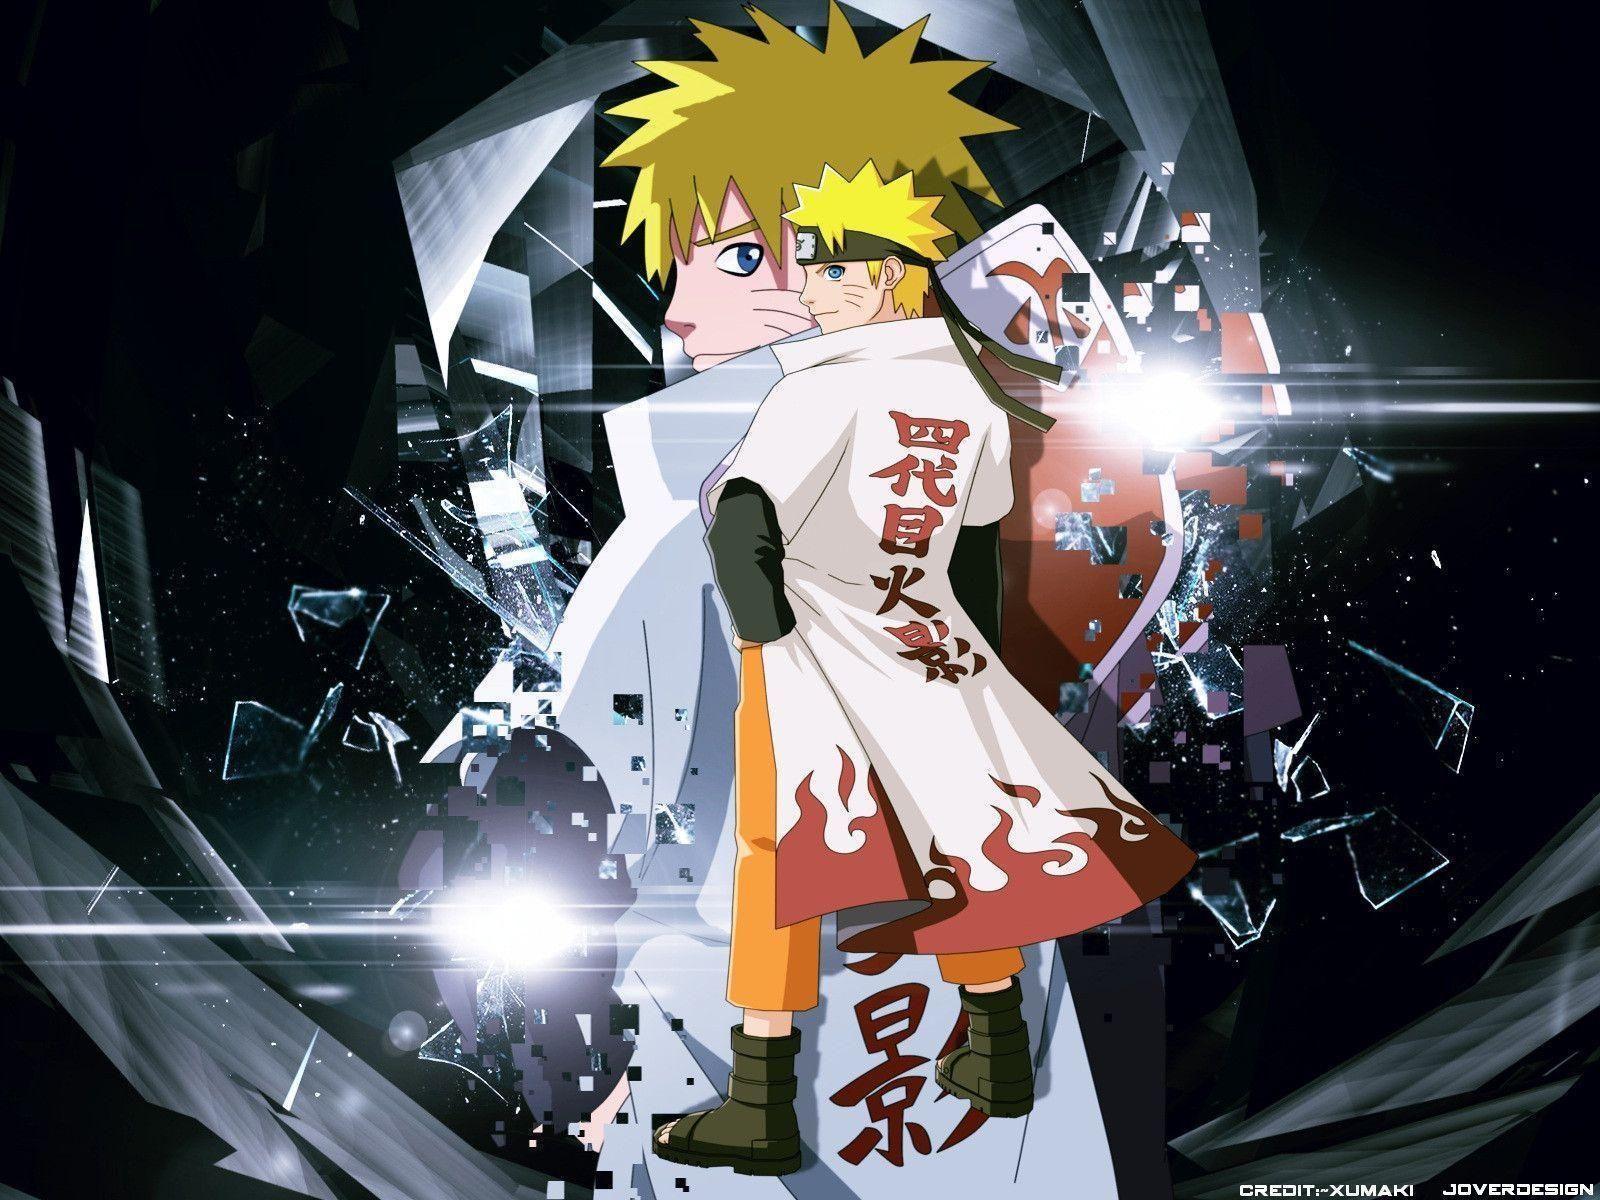 Kumpulan Wallpaper Android Naruto Shippuden Keren